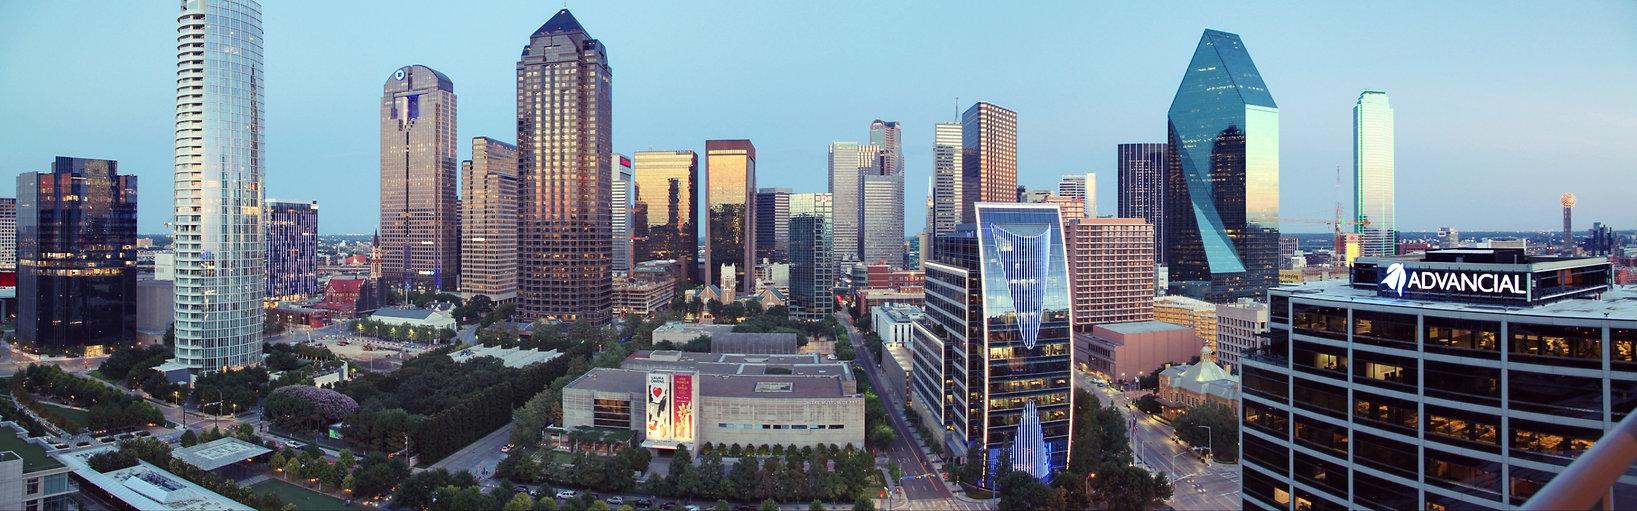 Downtown_Dallas_Skyline_edited.jpg